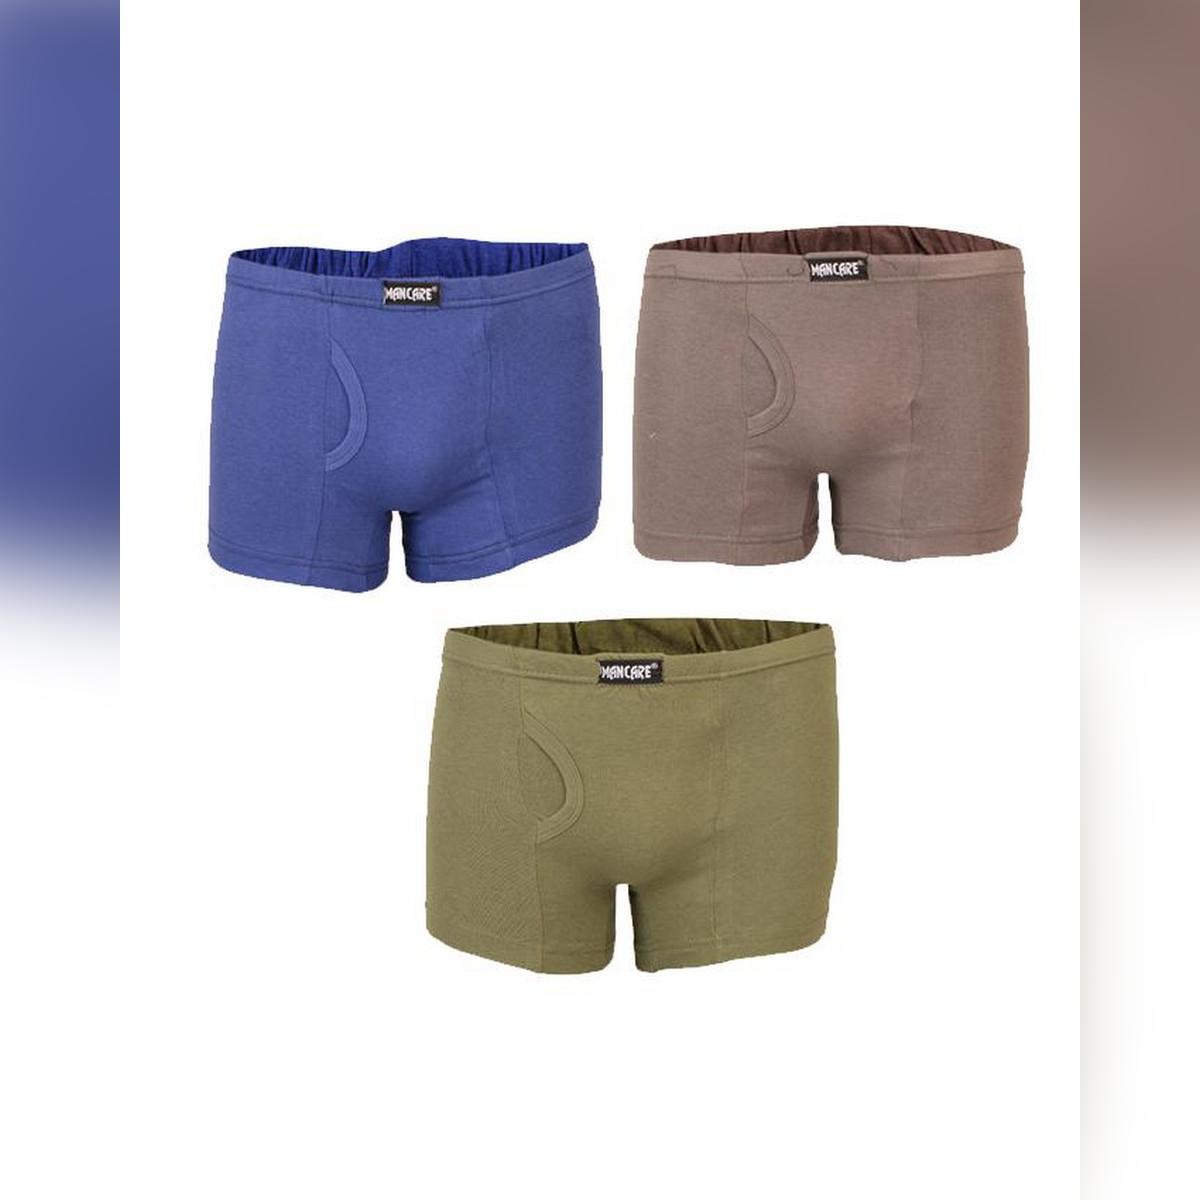 Mancare Pack of 3 Pure Cotton Underwear for Men - Multicolour